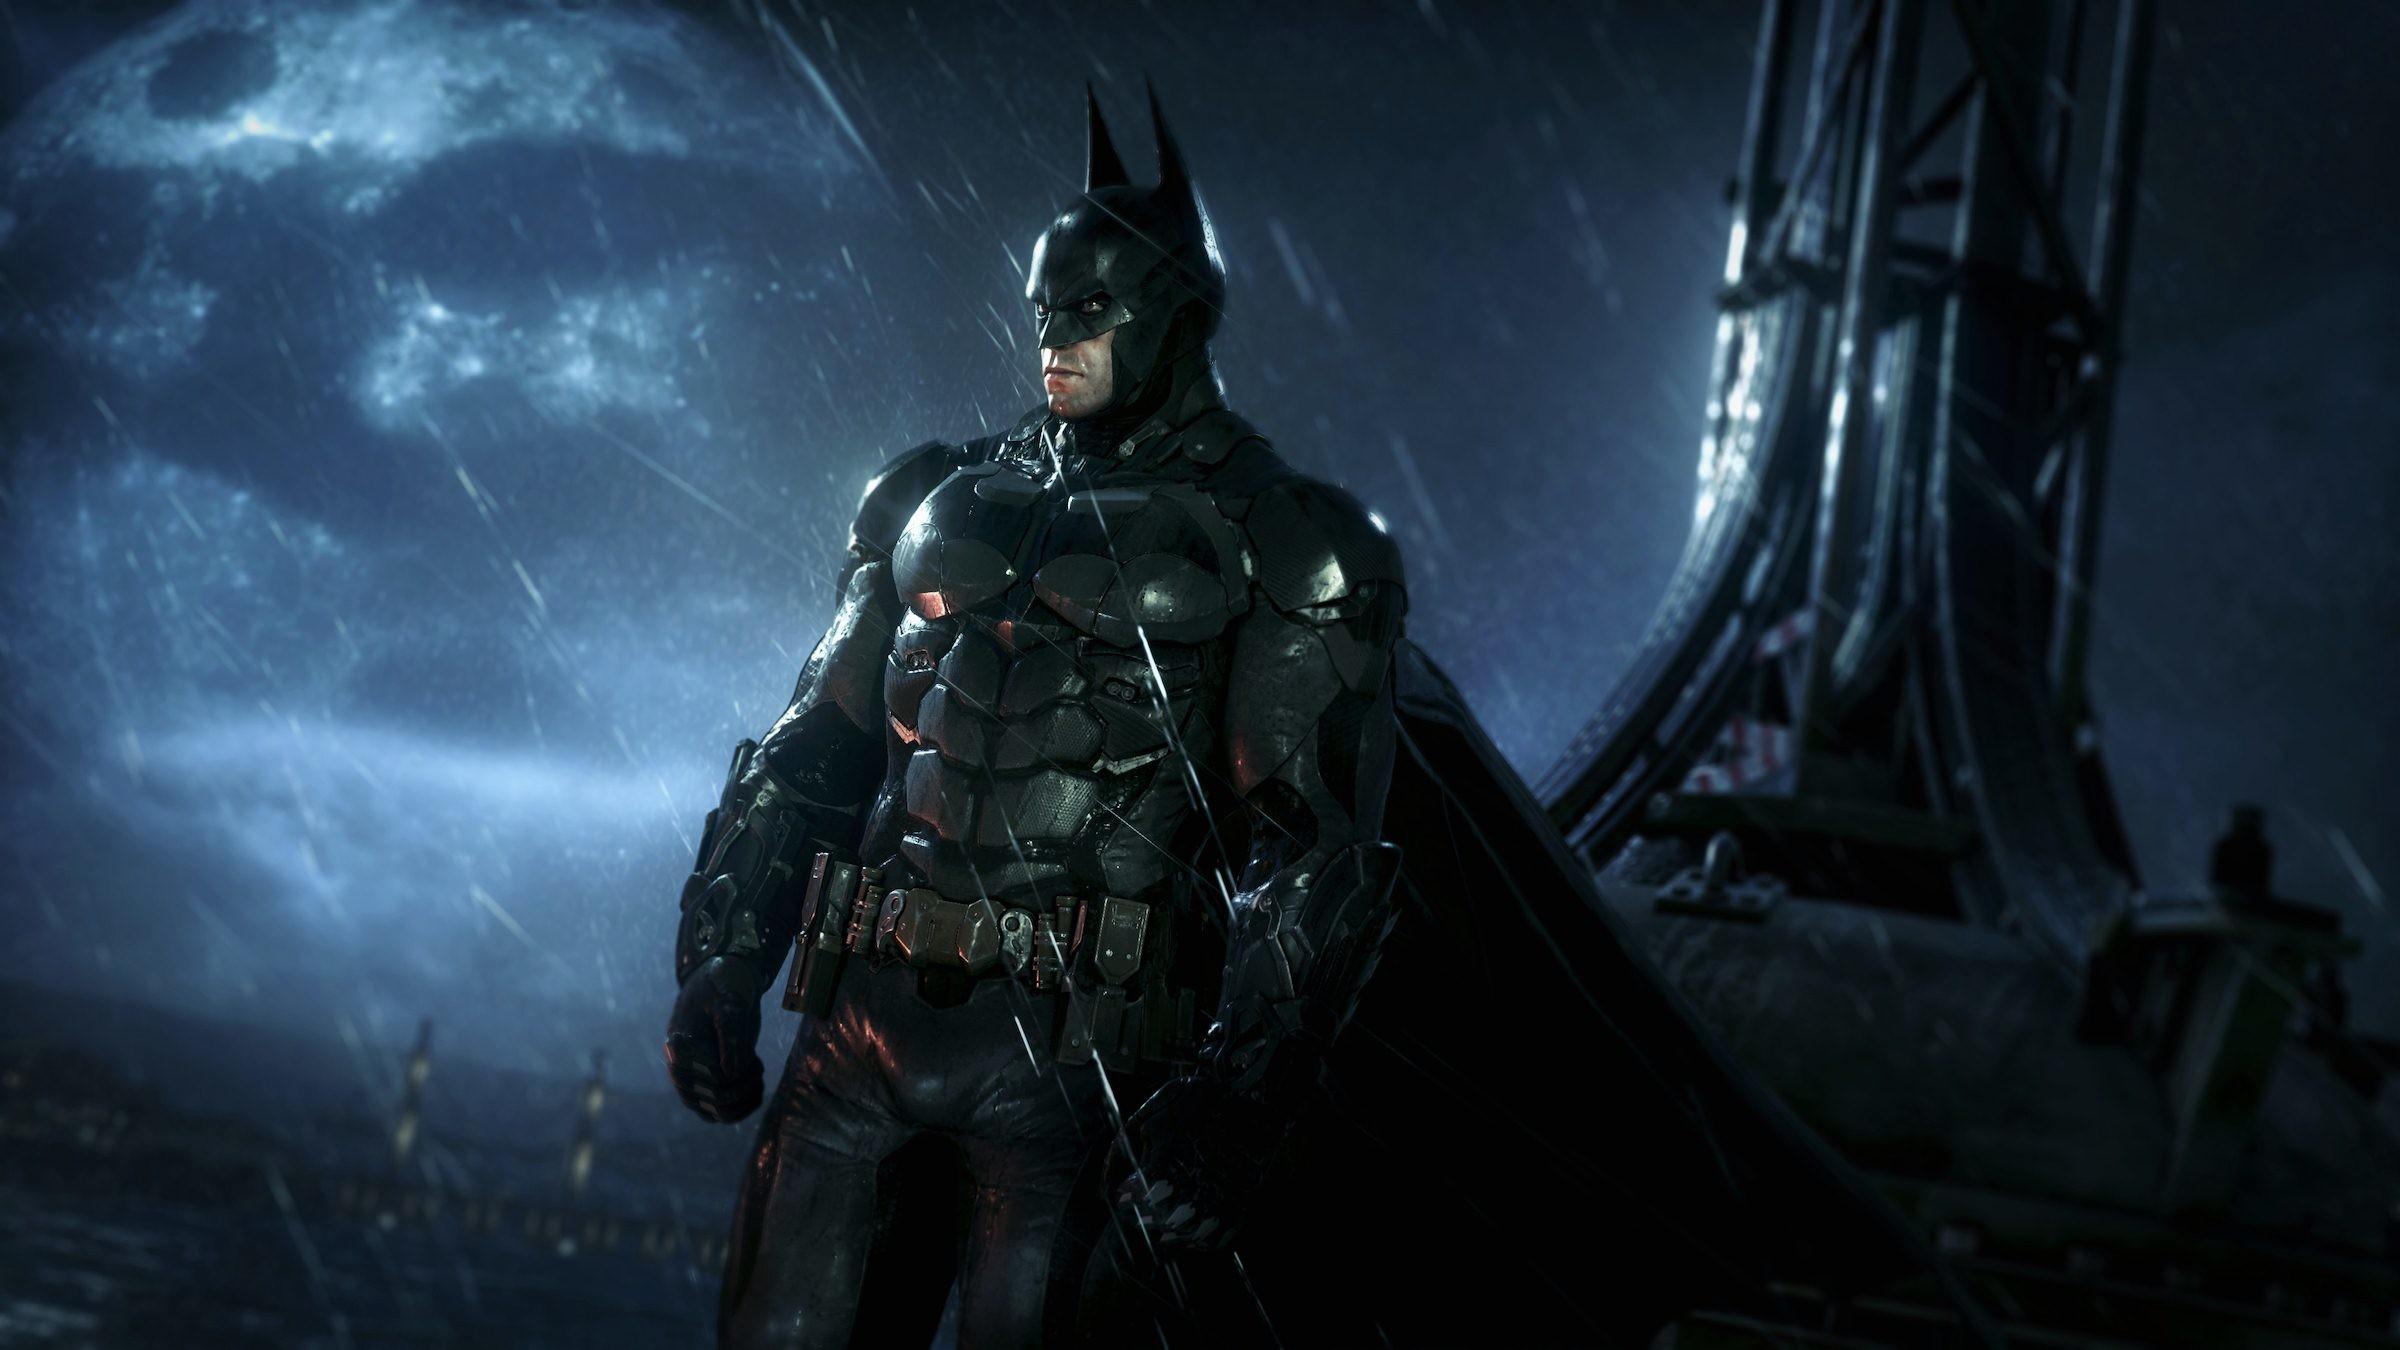 Batman Arkham City Wallpaper Hd 78 Pictures